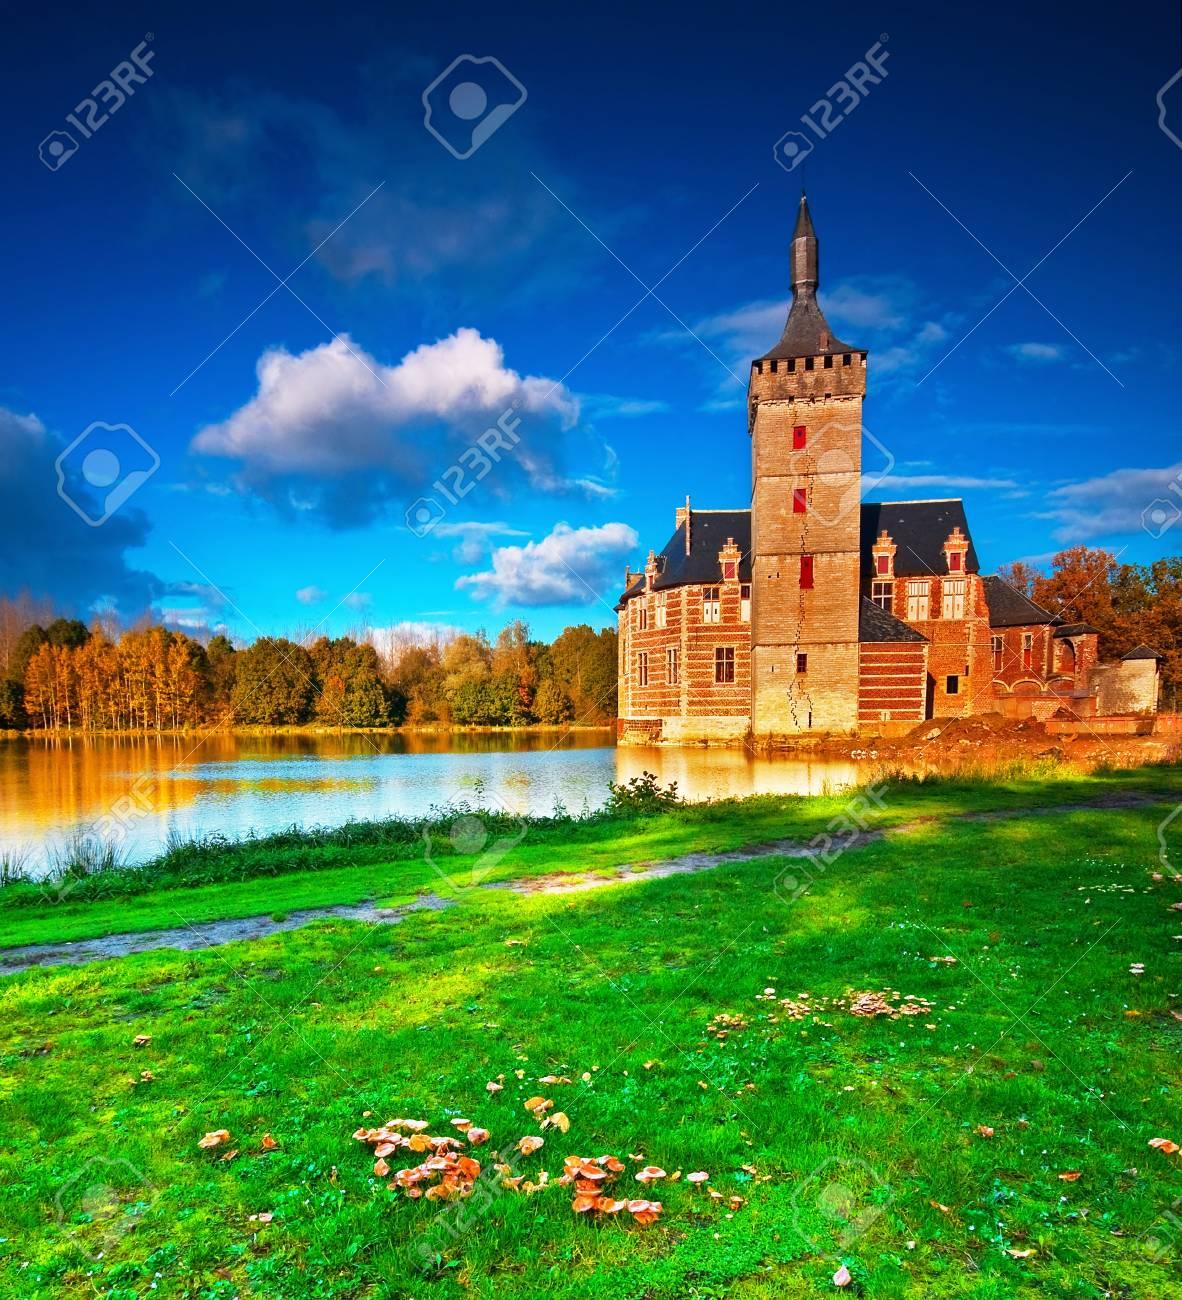 Nice medieval castle in Belgium  Stock Photo - 16652022